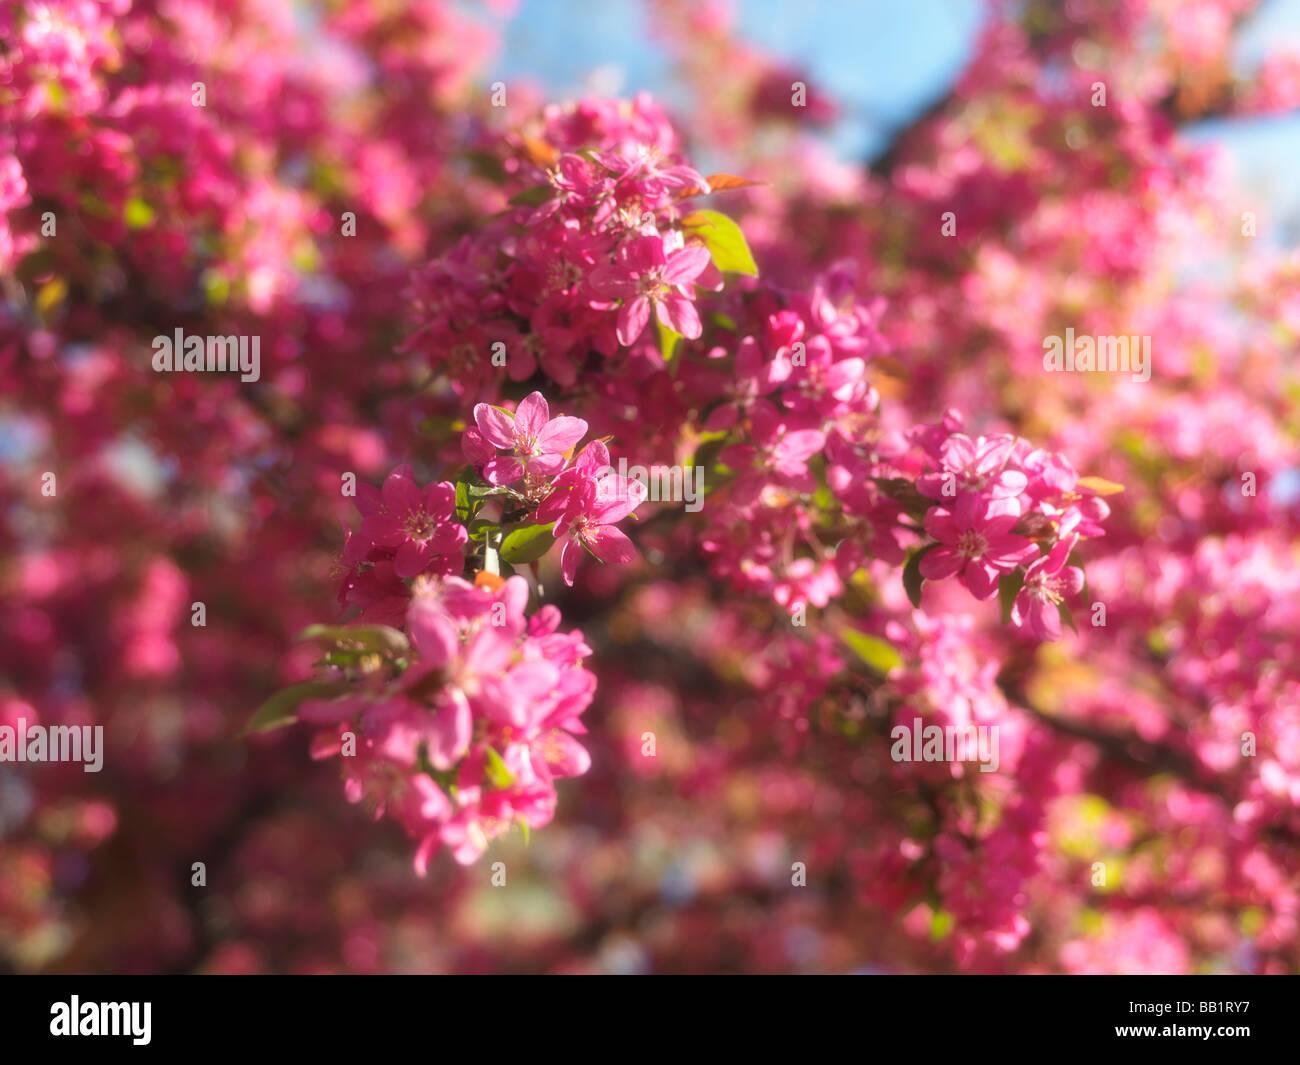 Purple Flowers Of Blossoming Crabapple Tree Toronto Ontario Canada